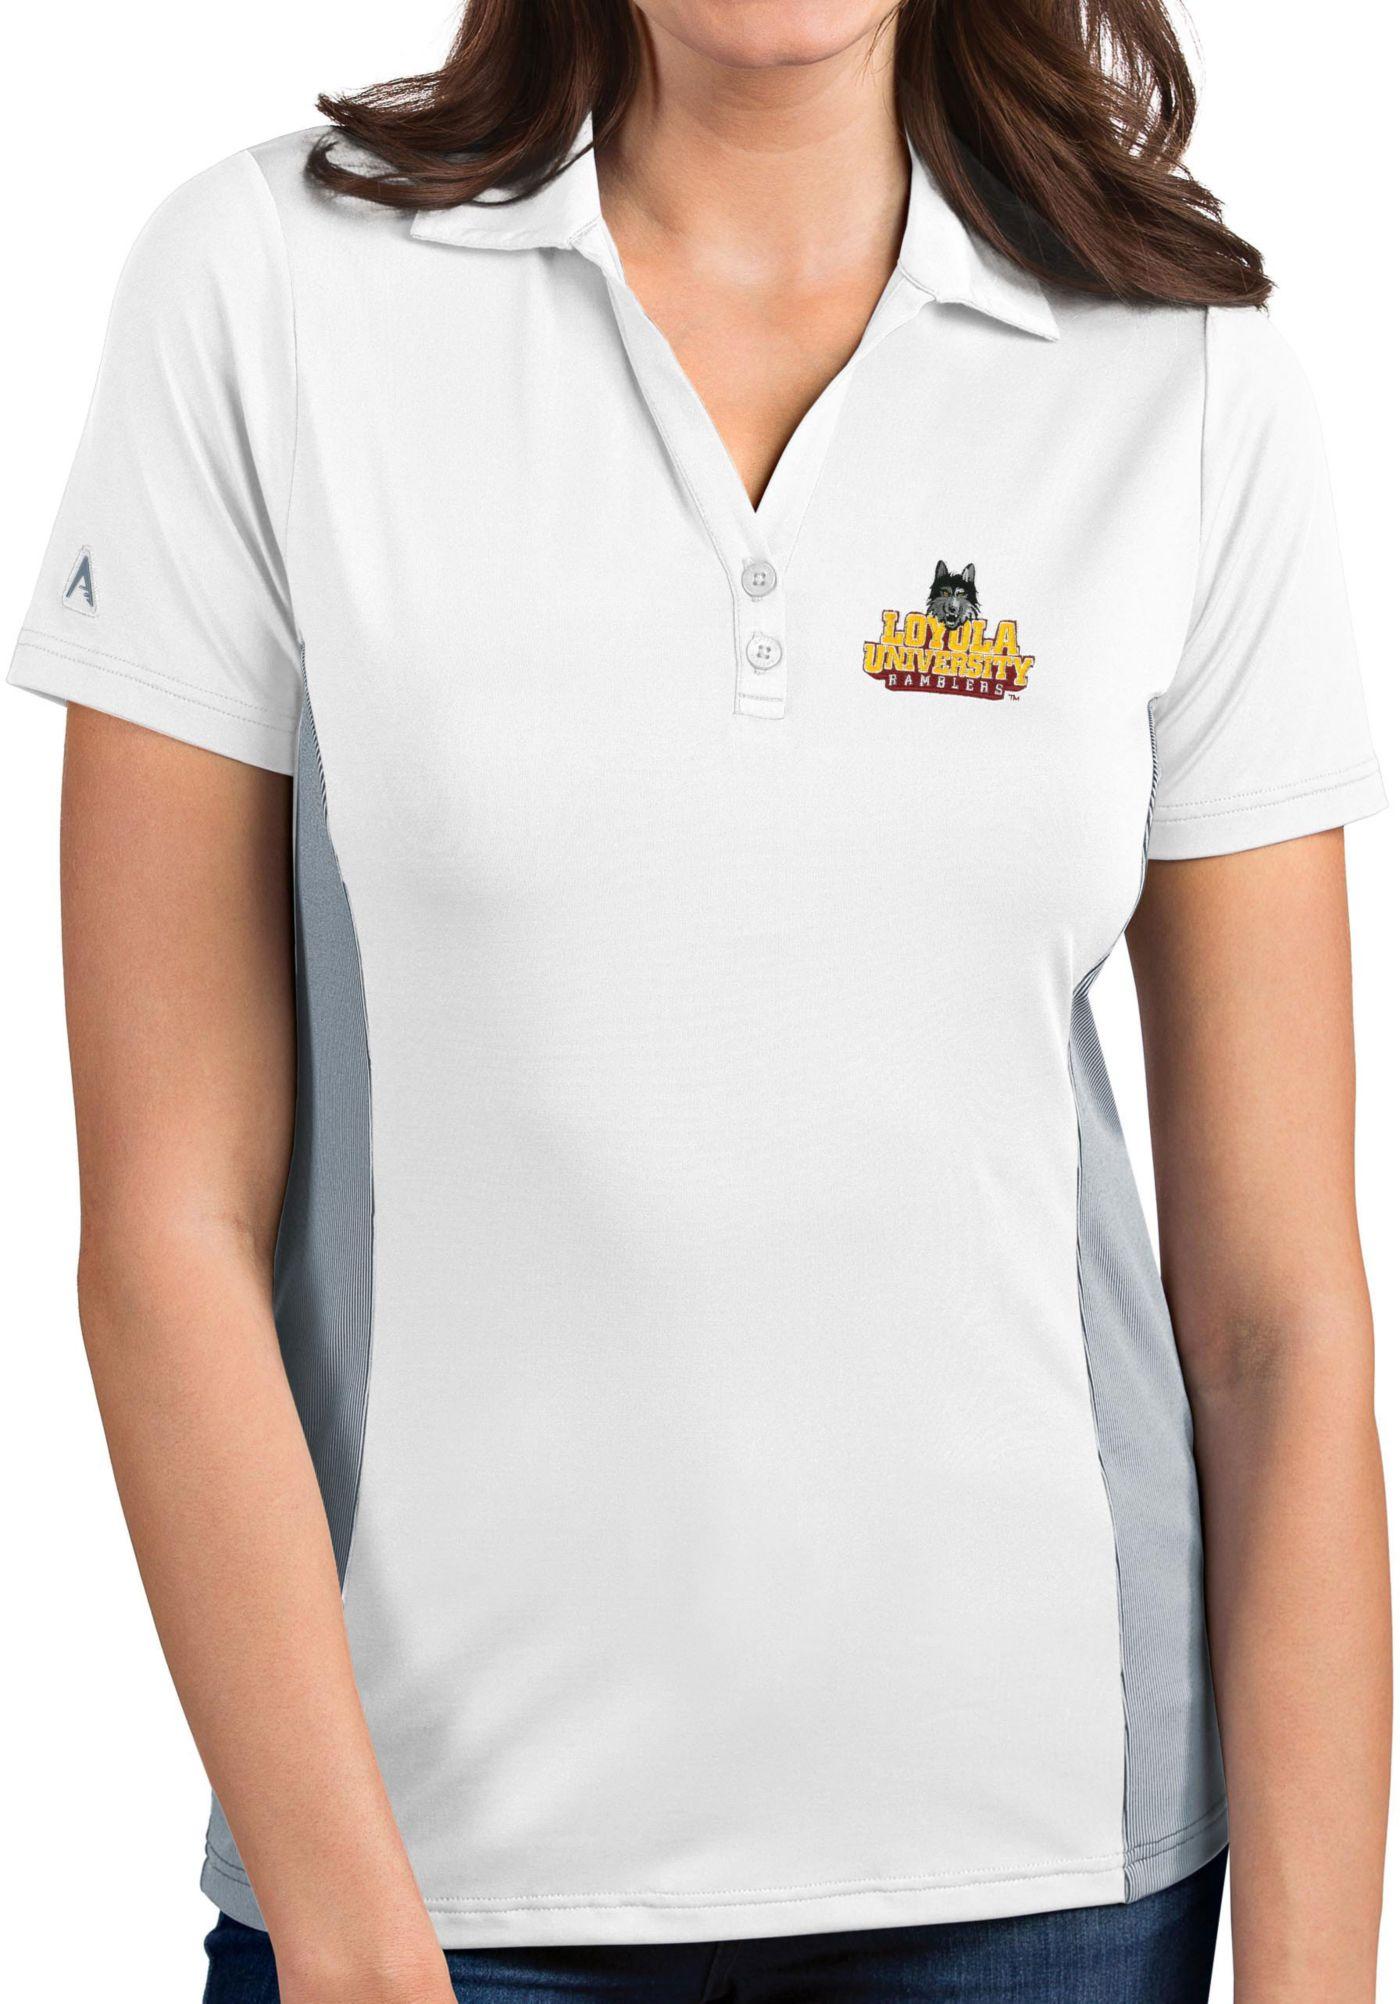 Antigua Women's Loyola - Chicago Ramblers Venture White Polo